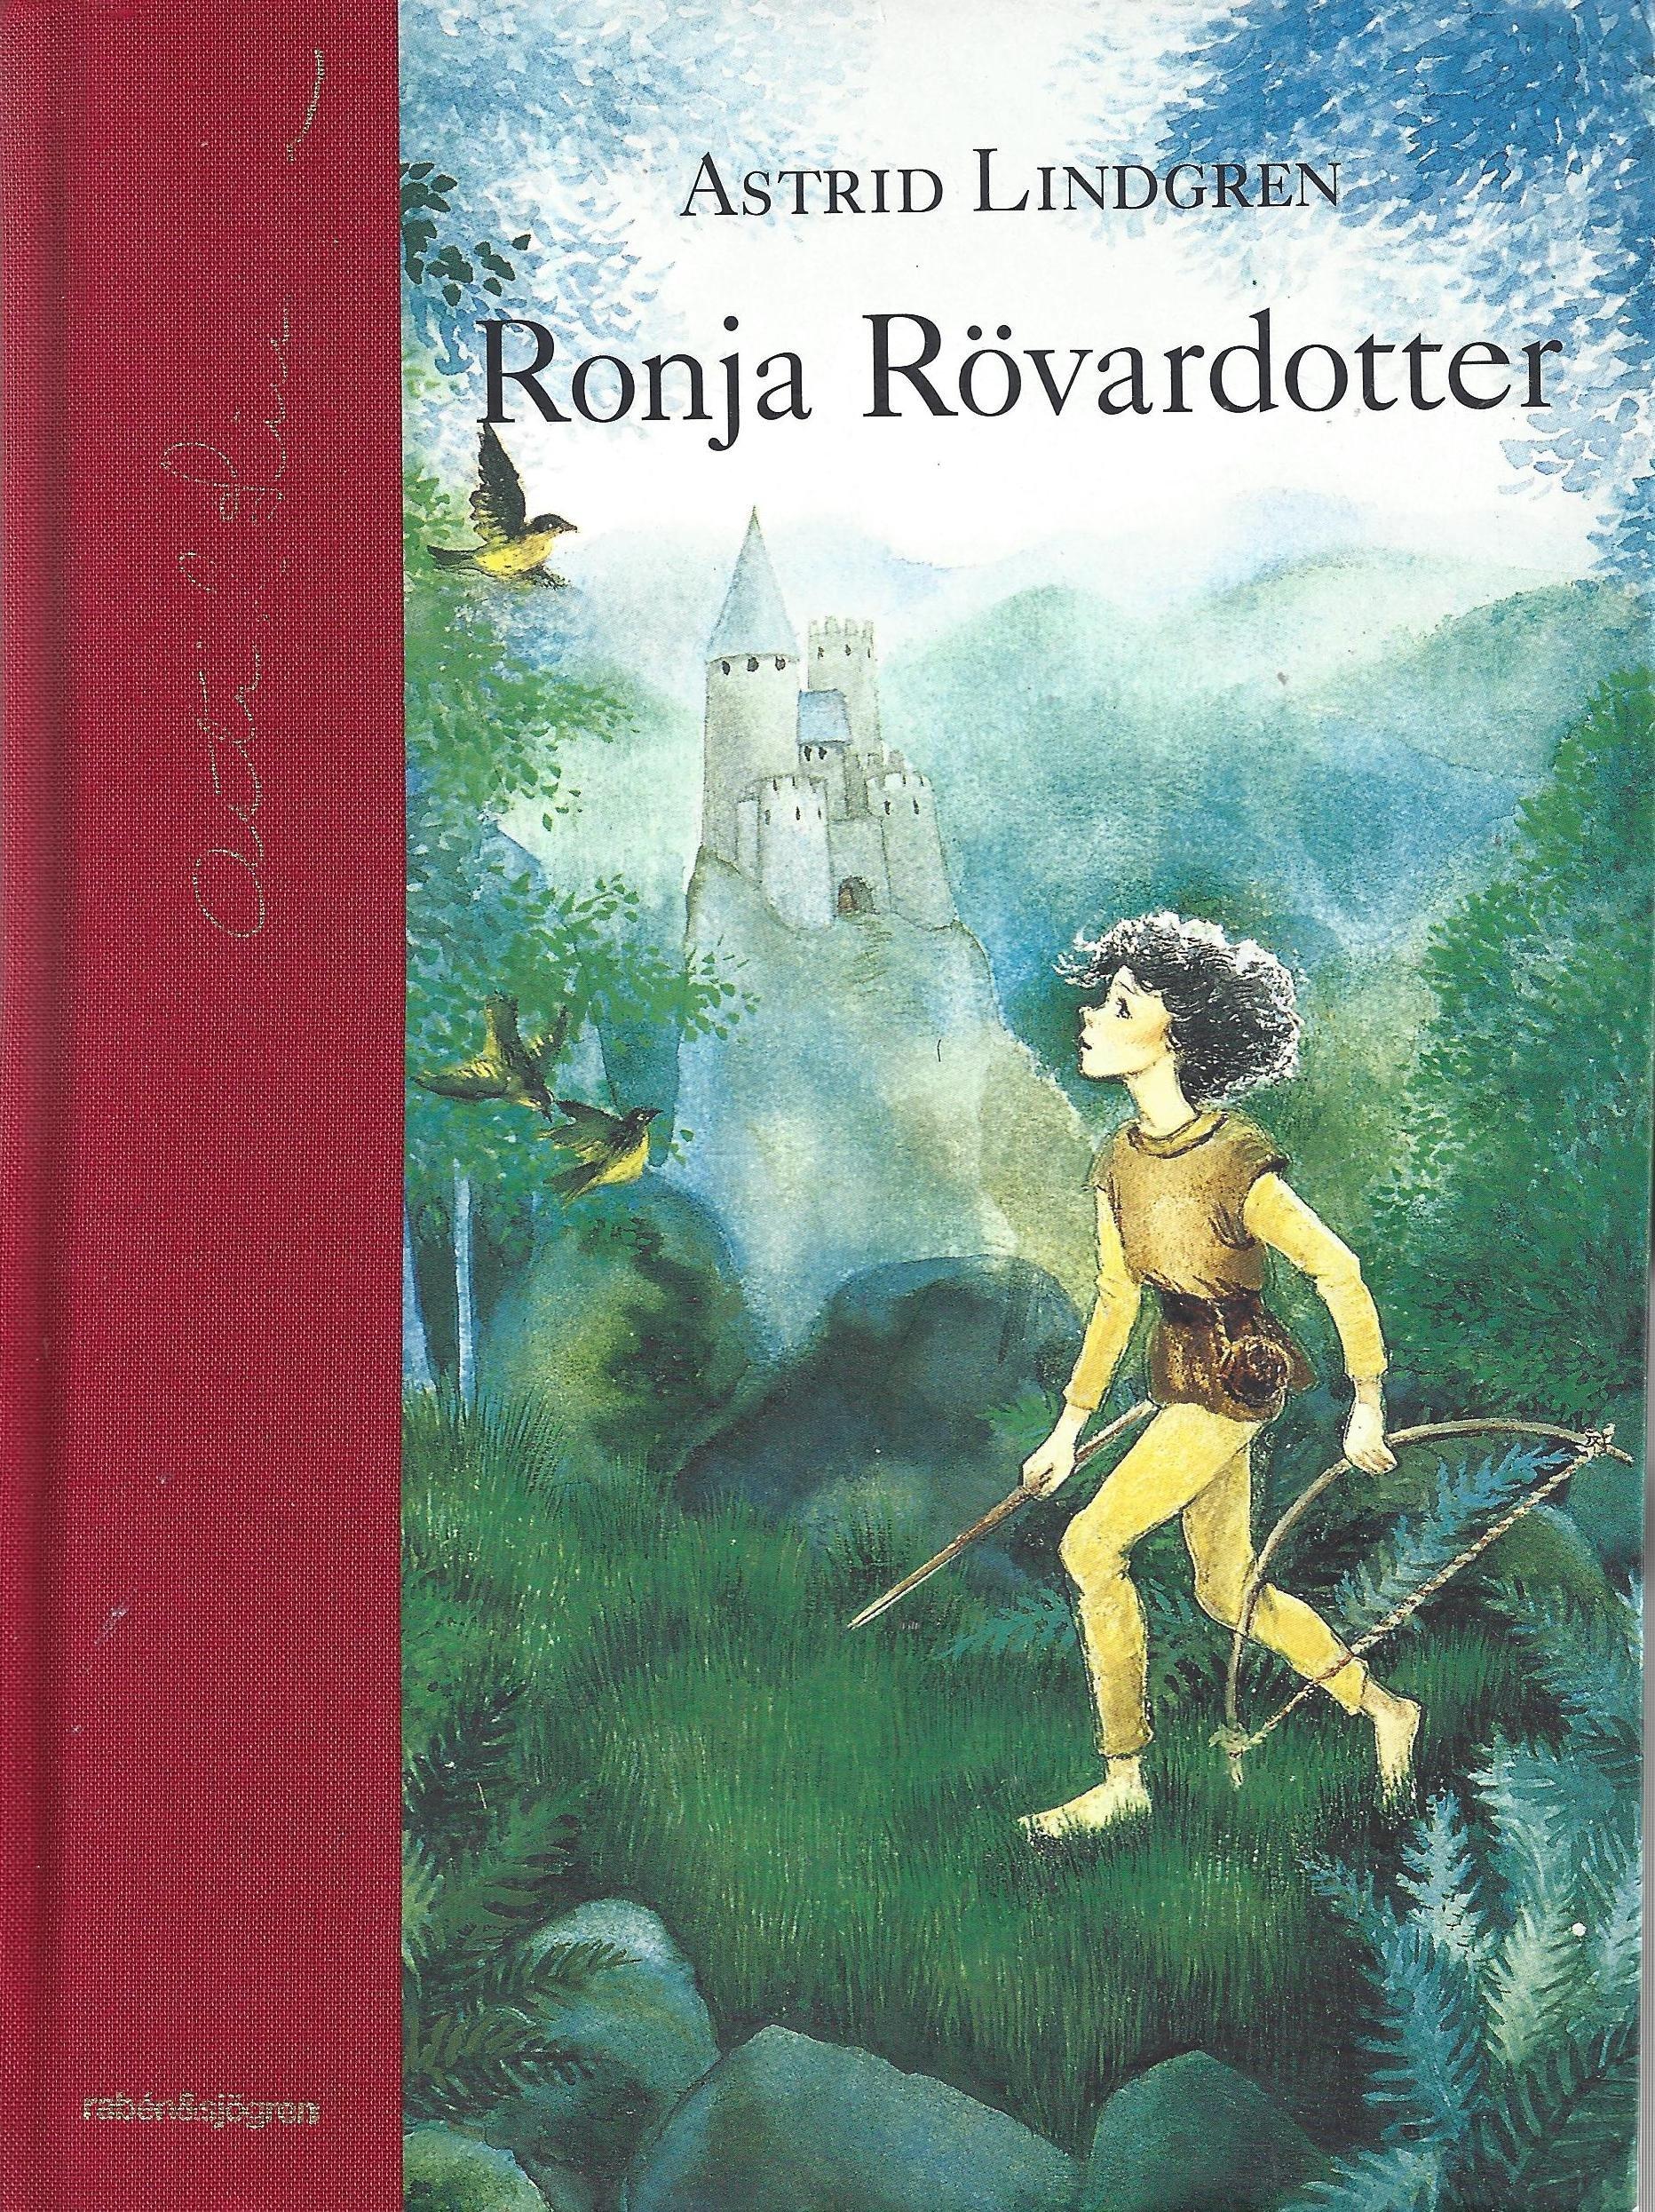 Ronja rövardotter (Swedish Edition)